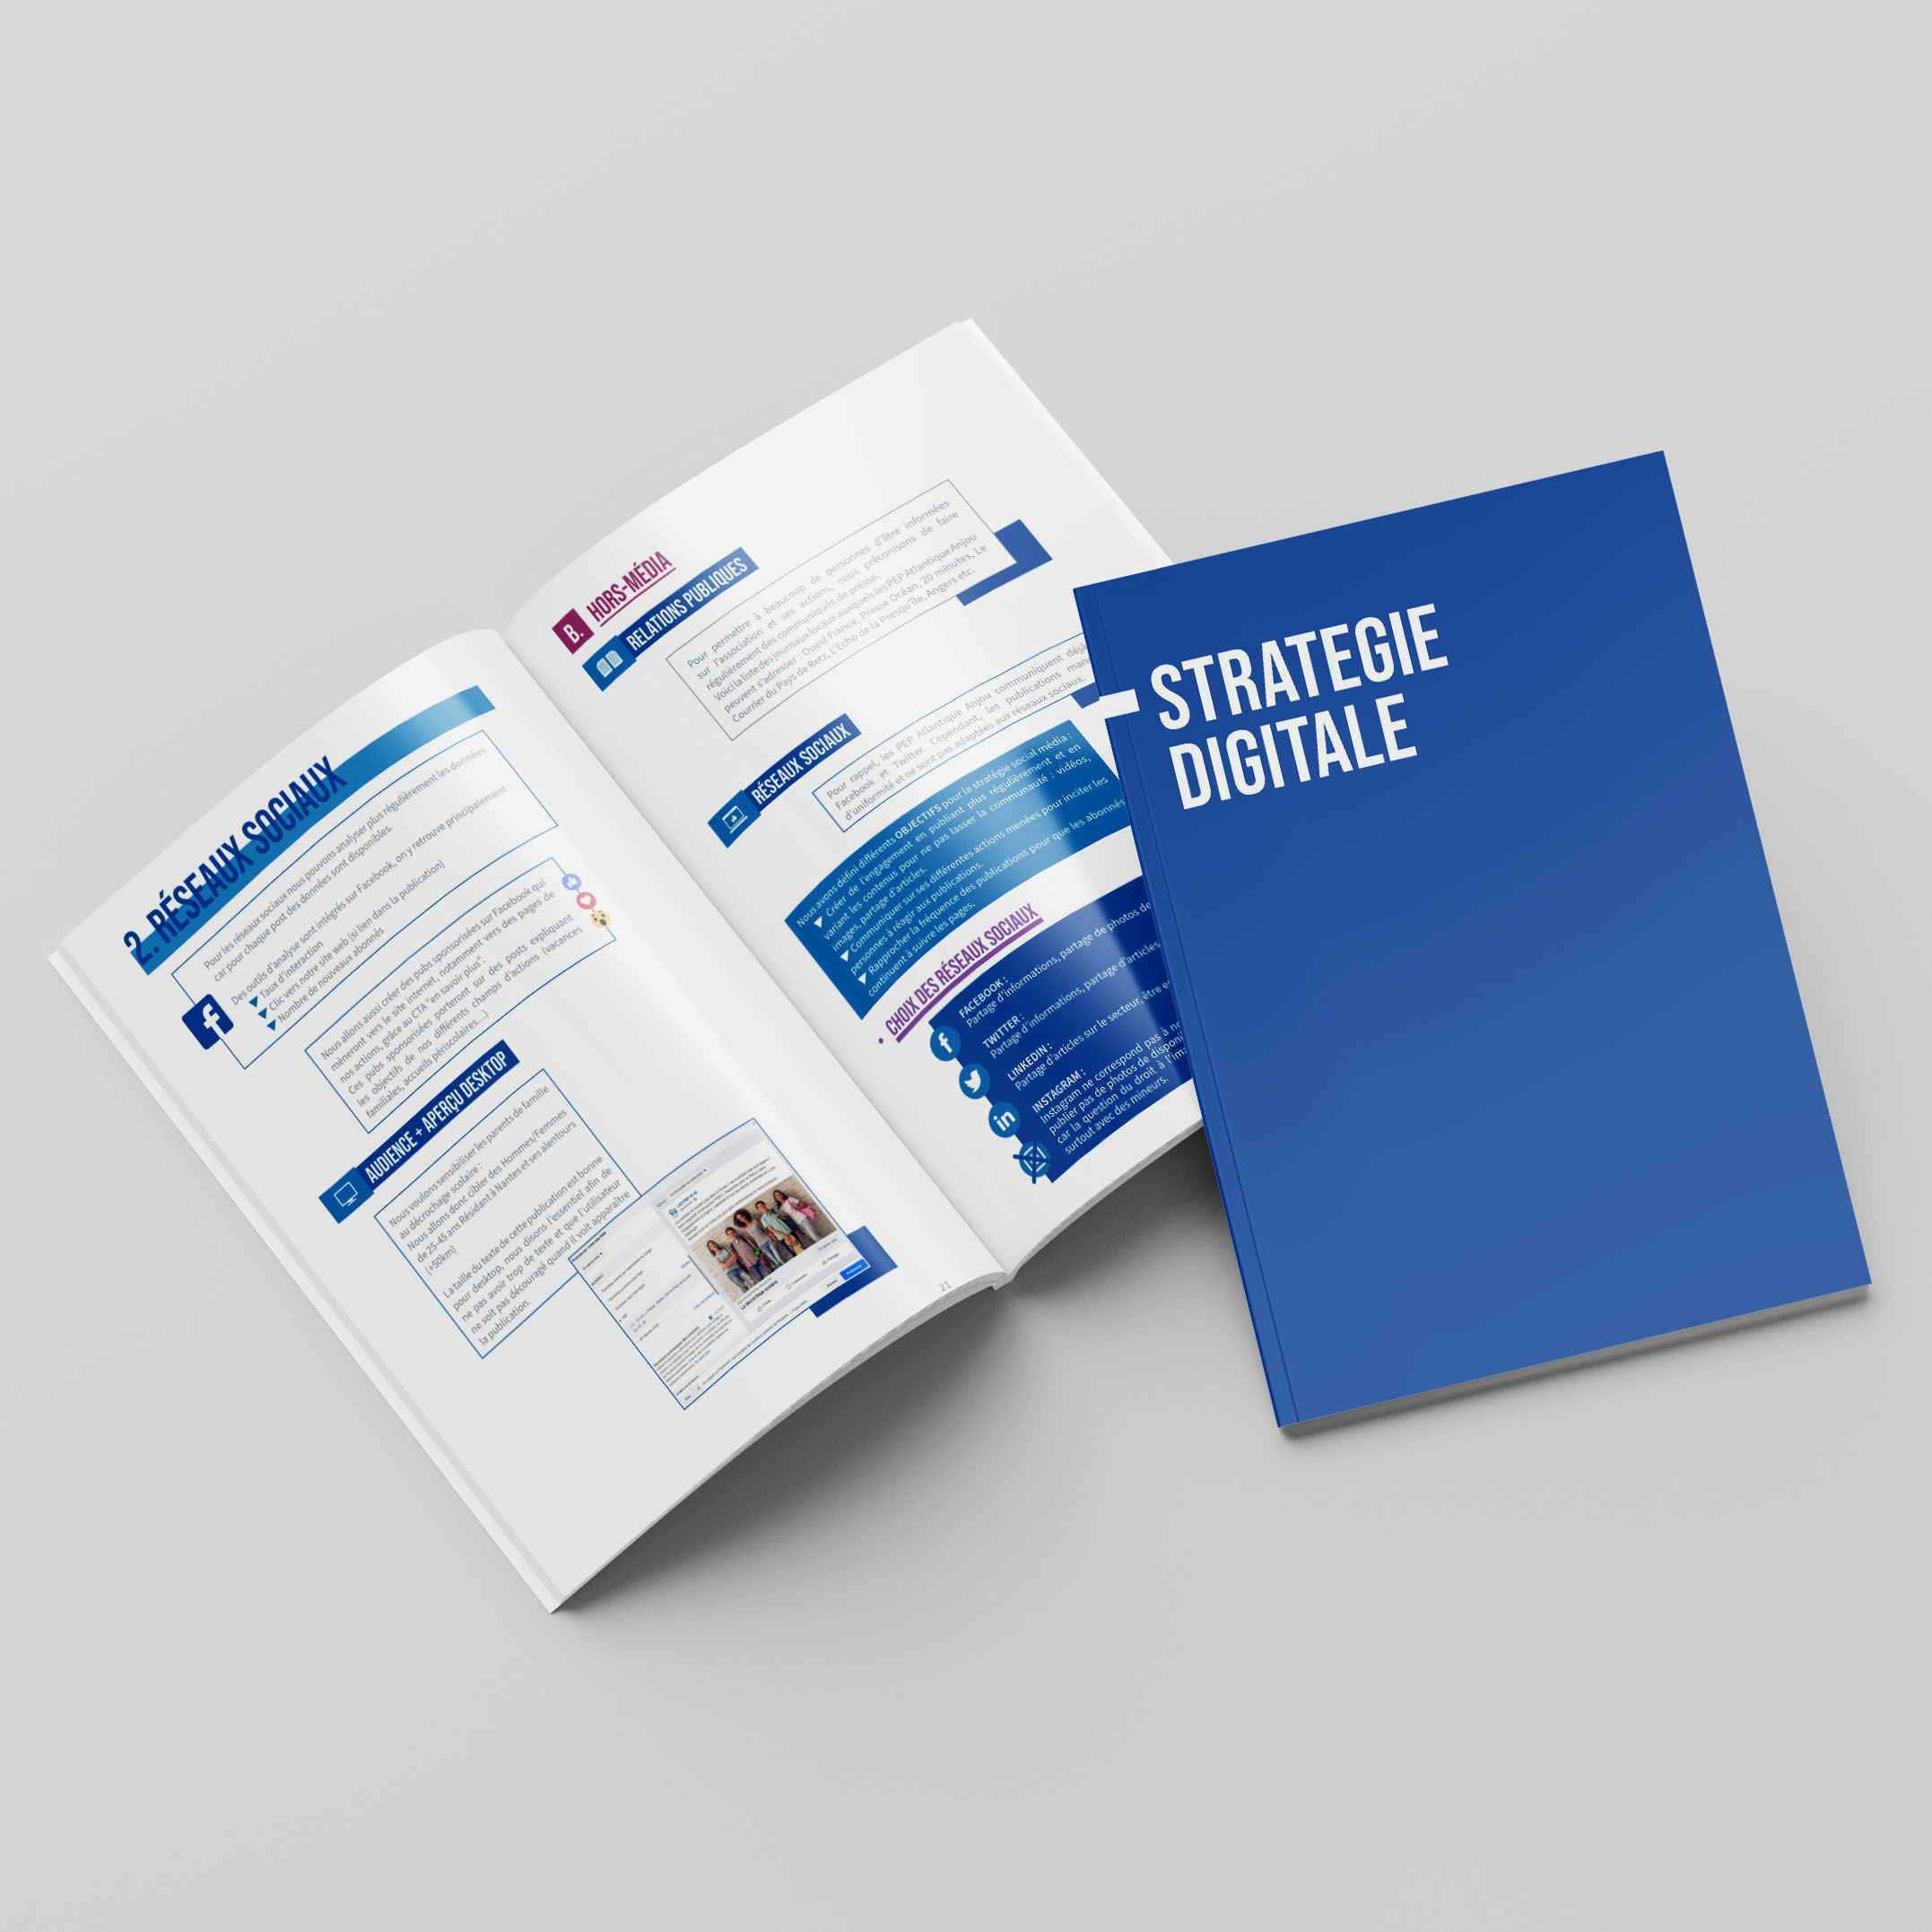 Brochure Stratégie Digitale